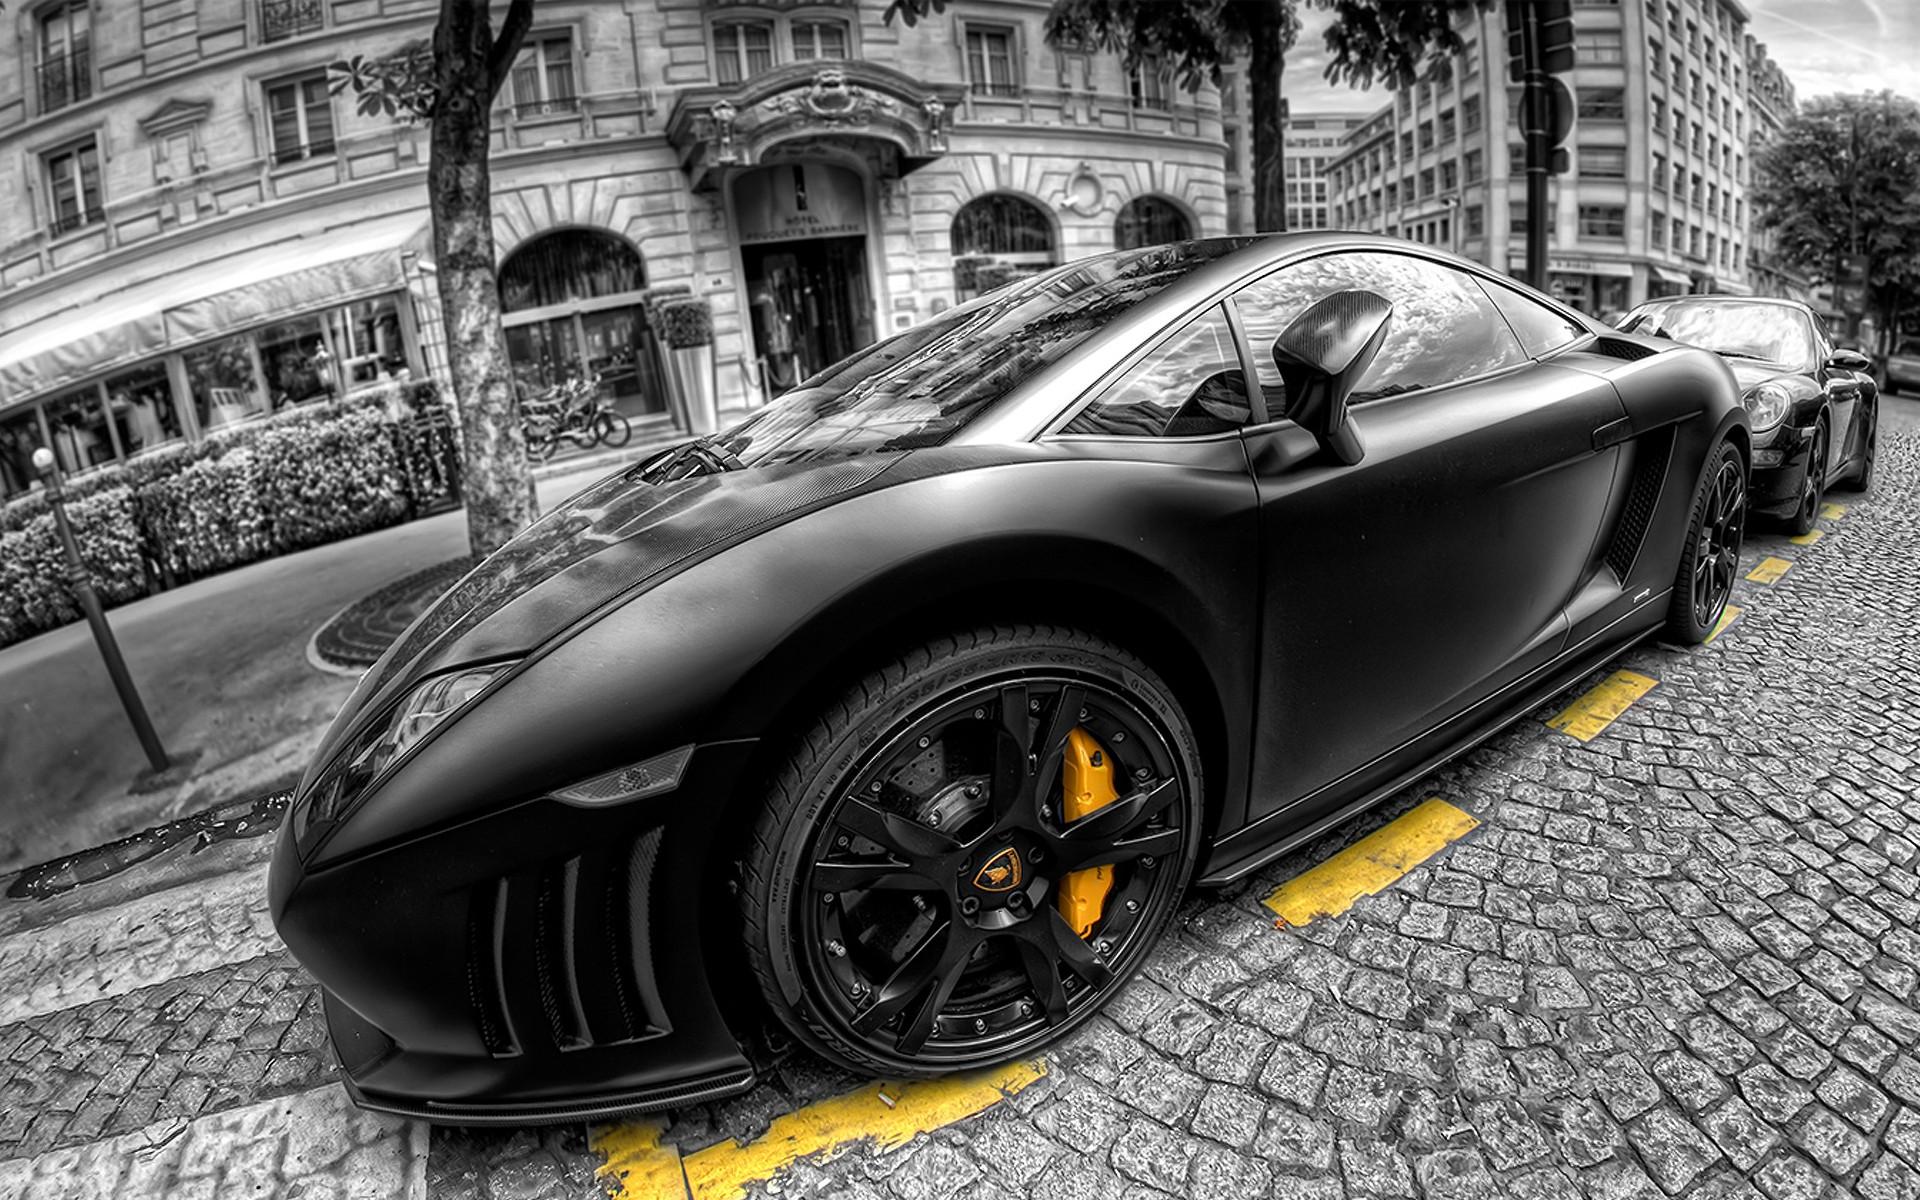 Wallpaper Kota Mewarnai Selektif Lamborghini Aventador